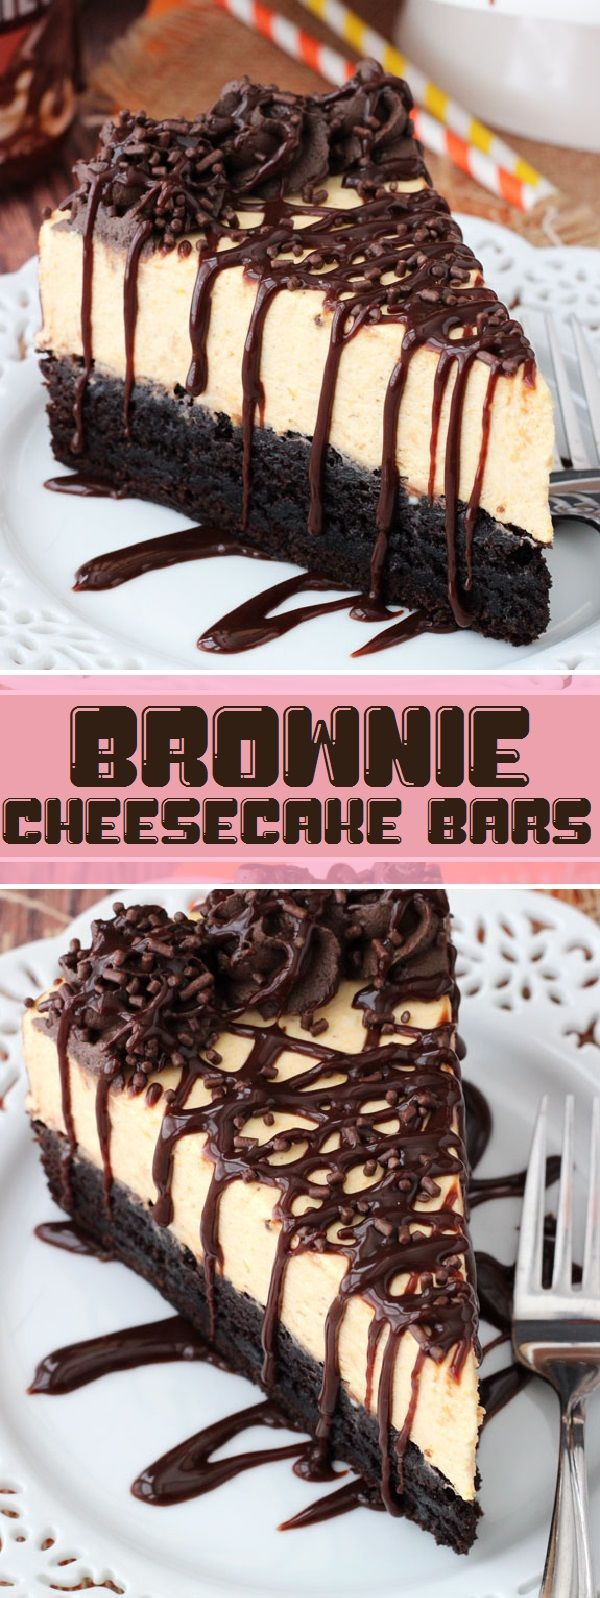 BROWNIE CHEESECAKE BARS | SLOW COOKING19